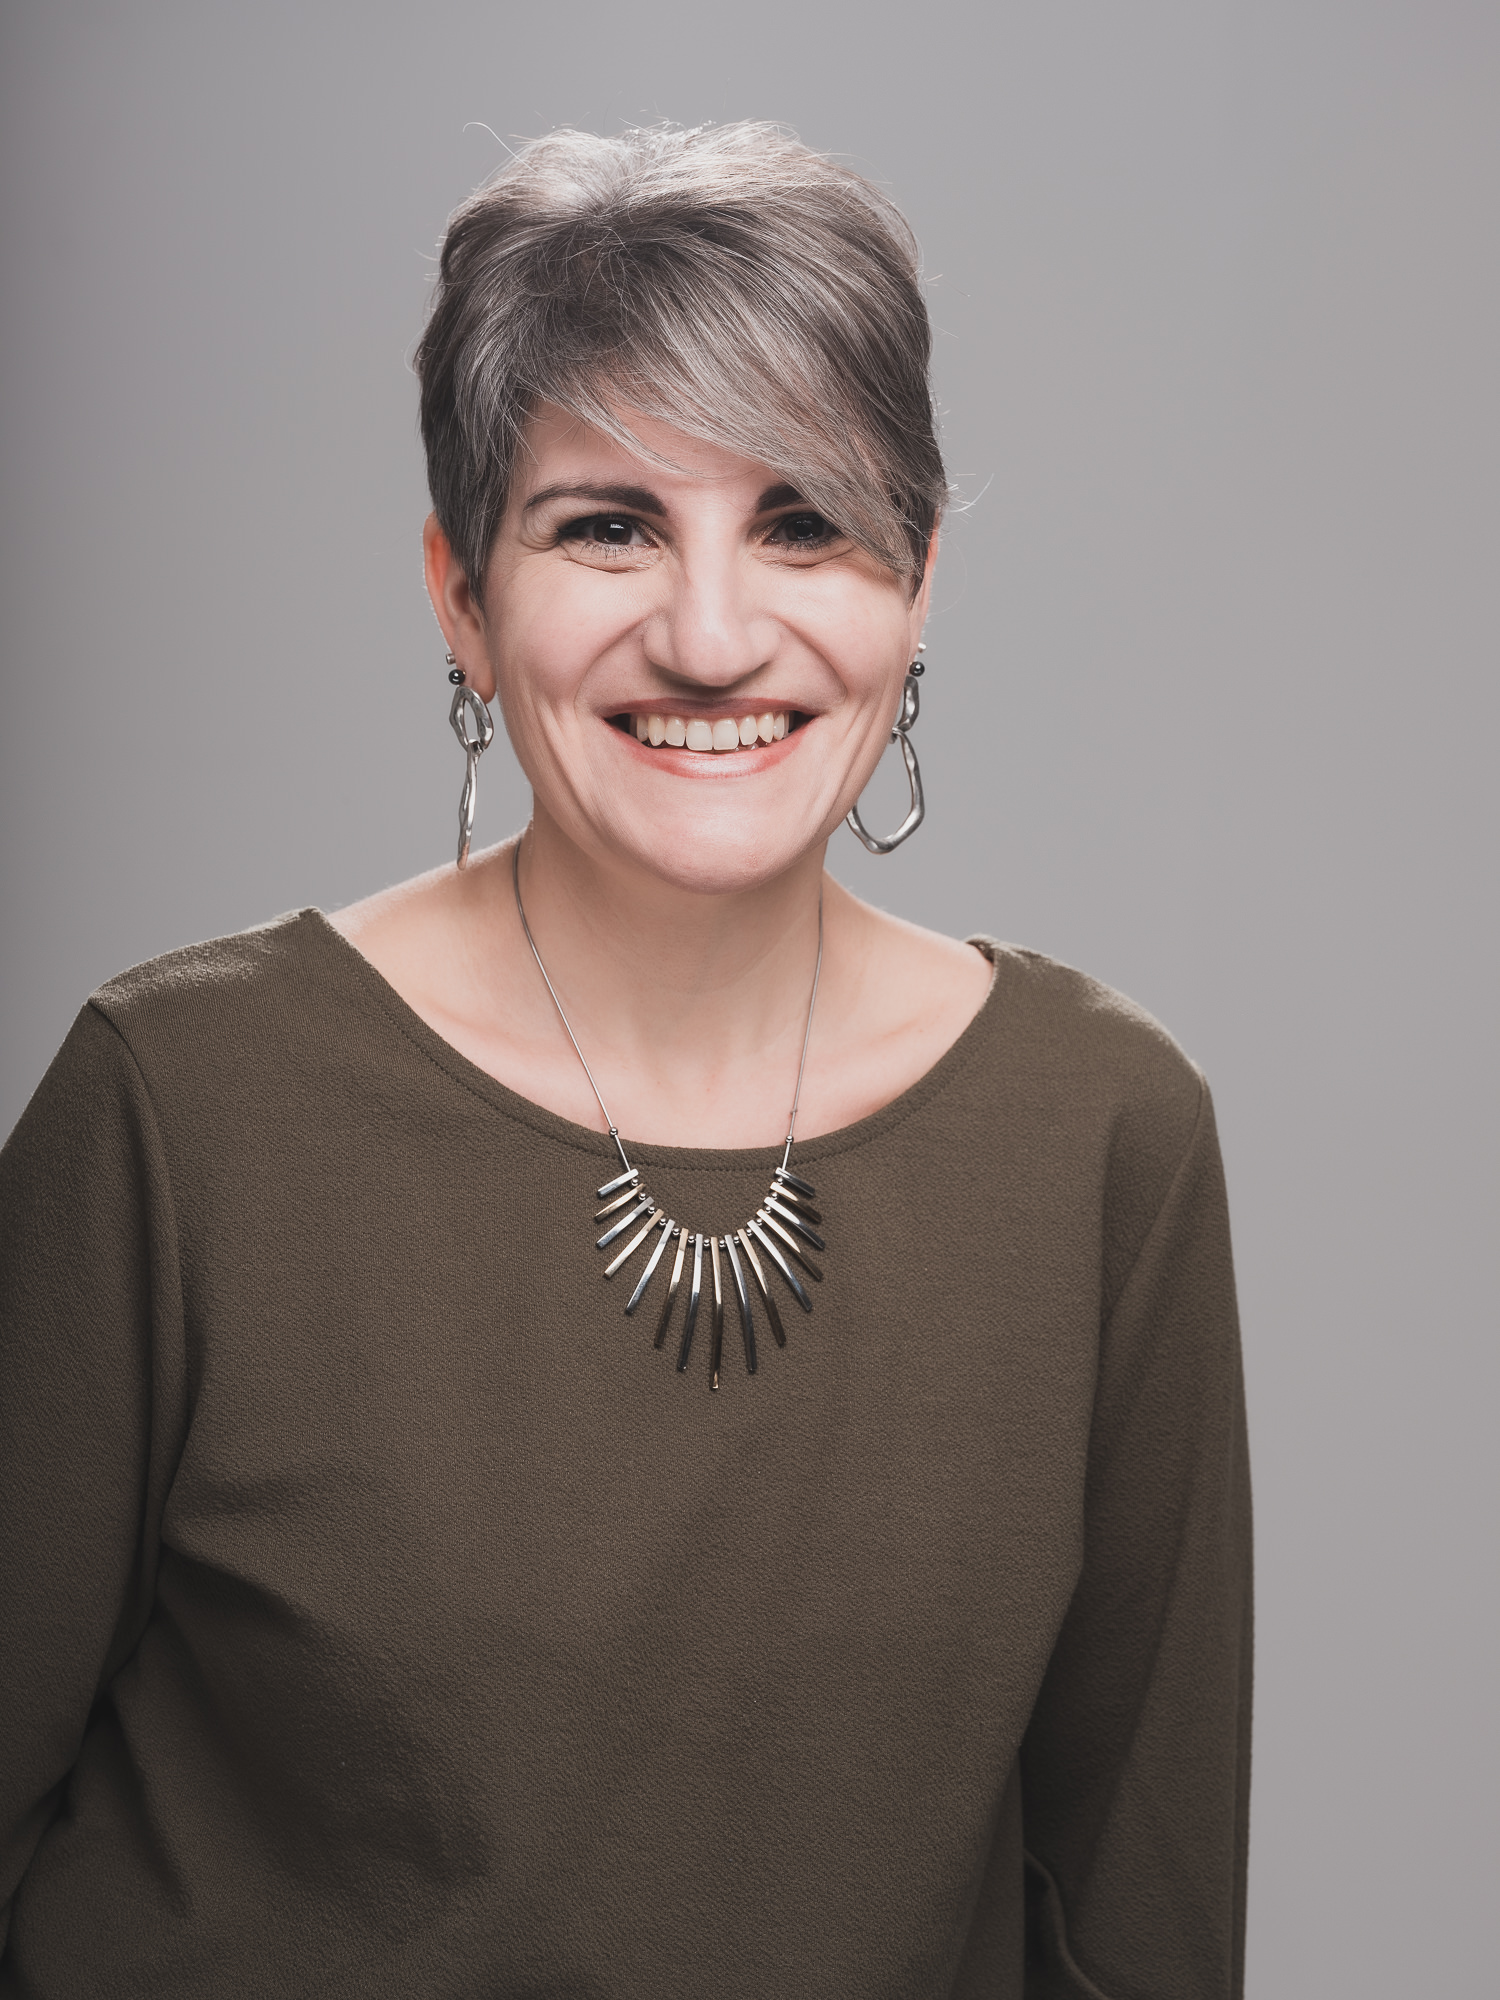 Sonia Nocera